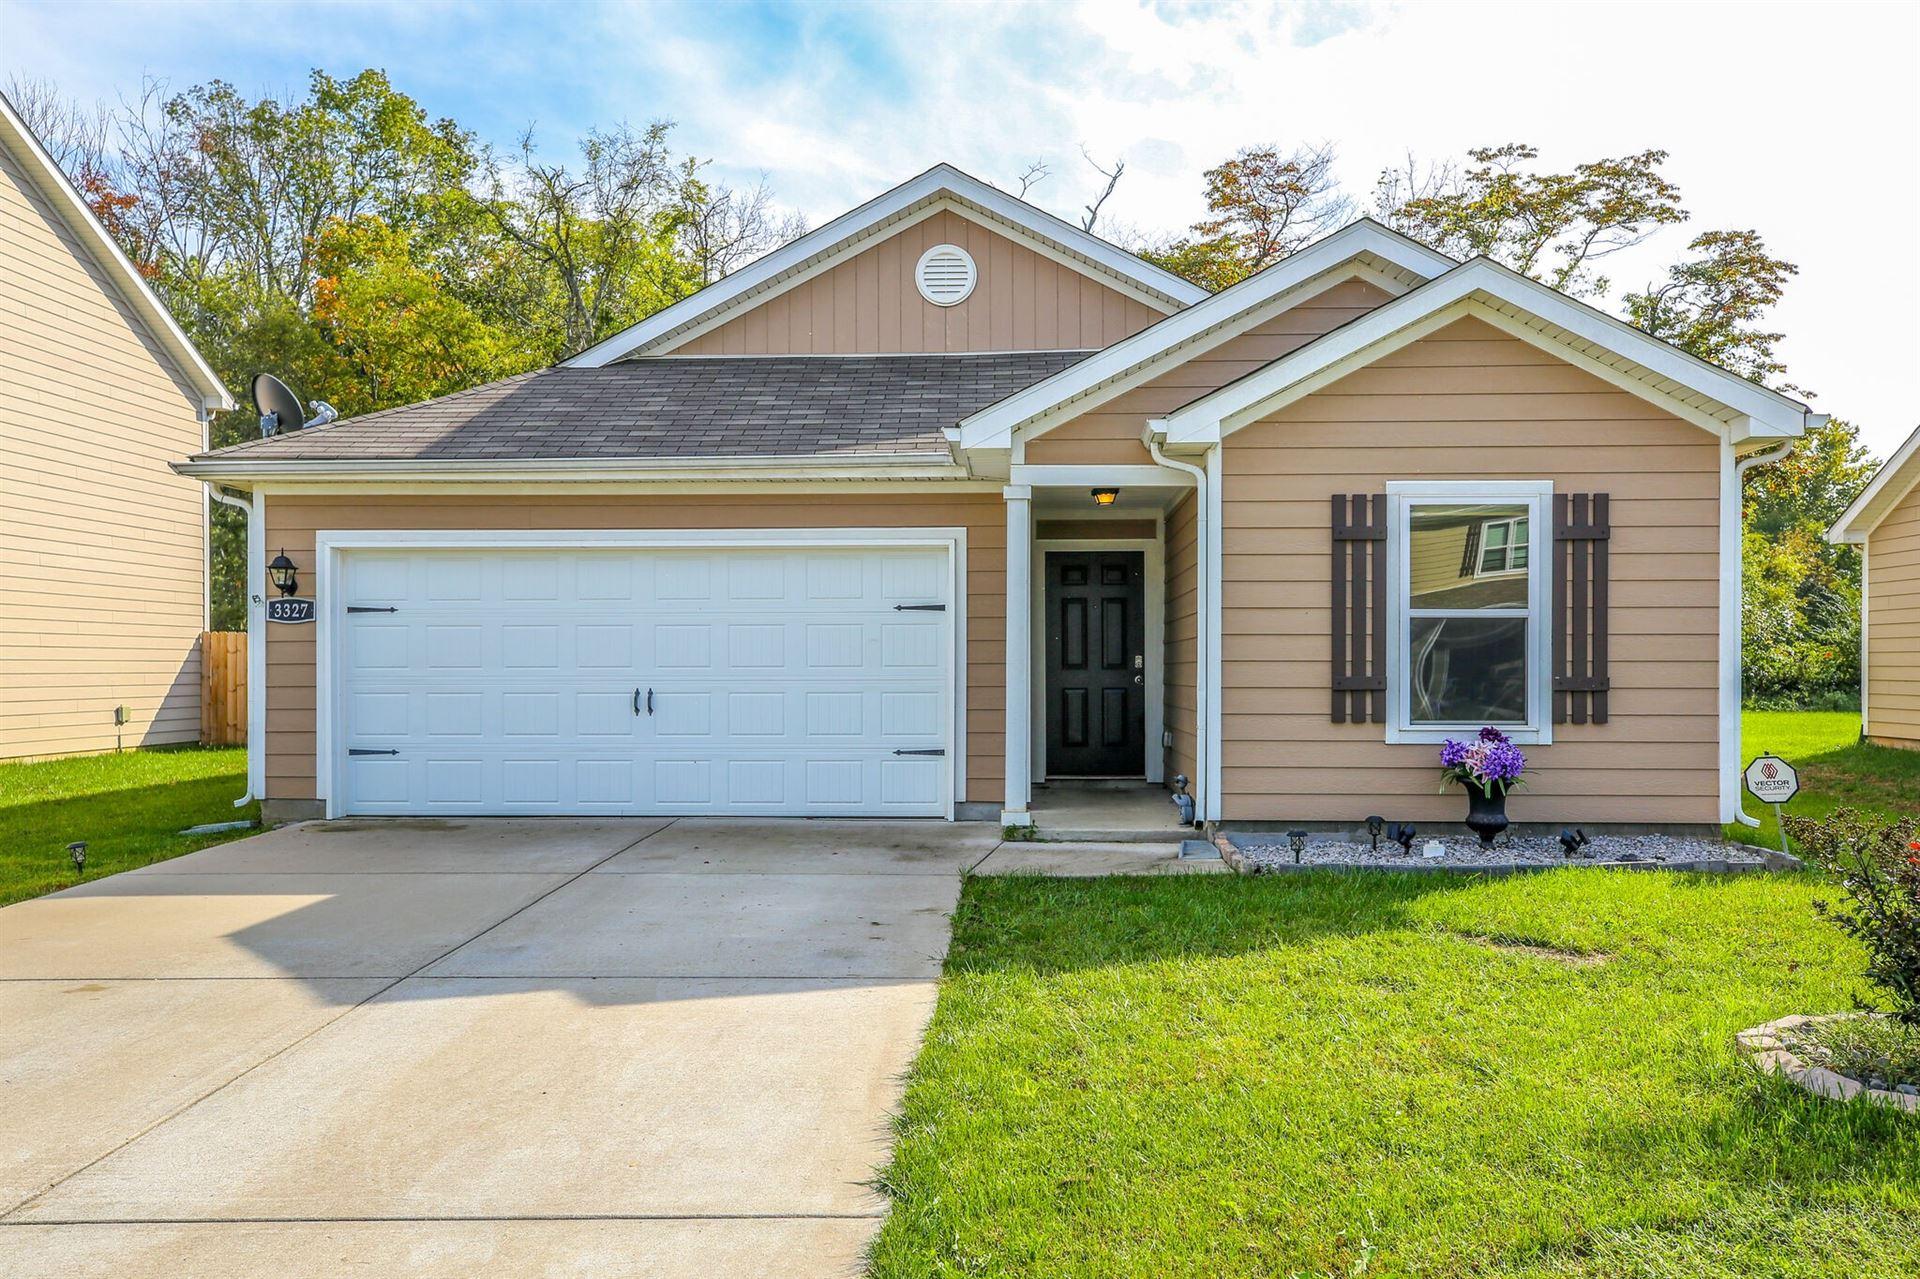 3327 Drysdale Dr, Murfreesboro, TN 37128 - MLS#: 2298787